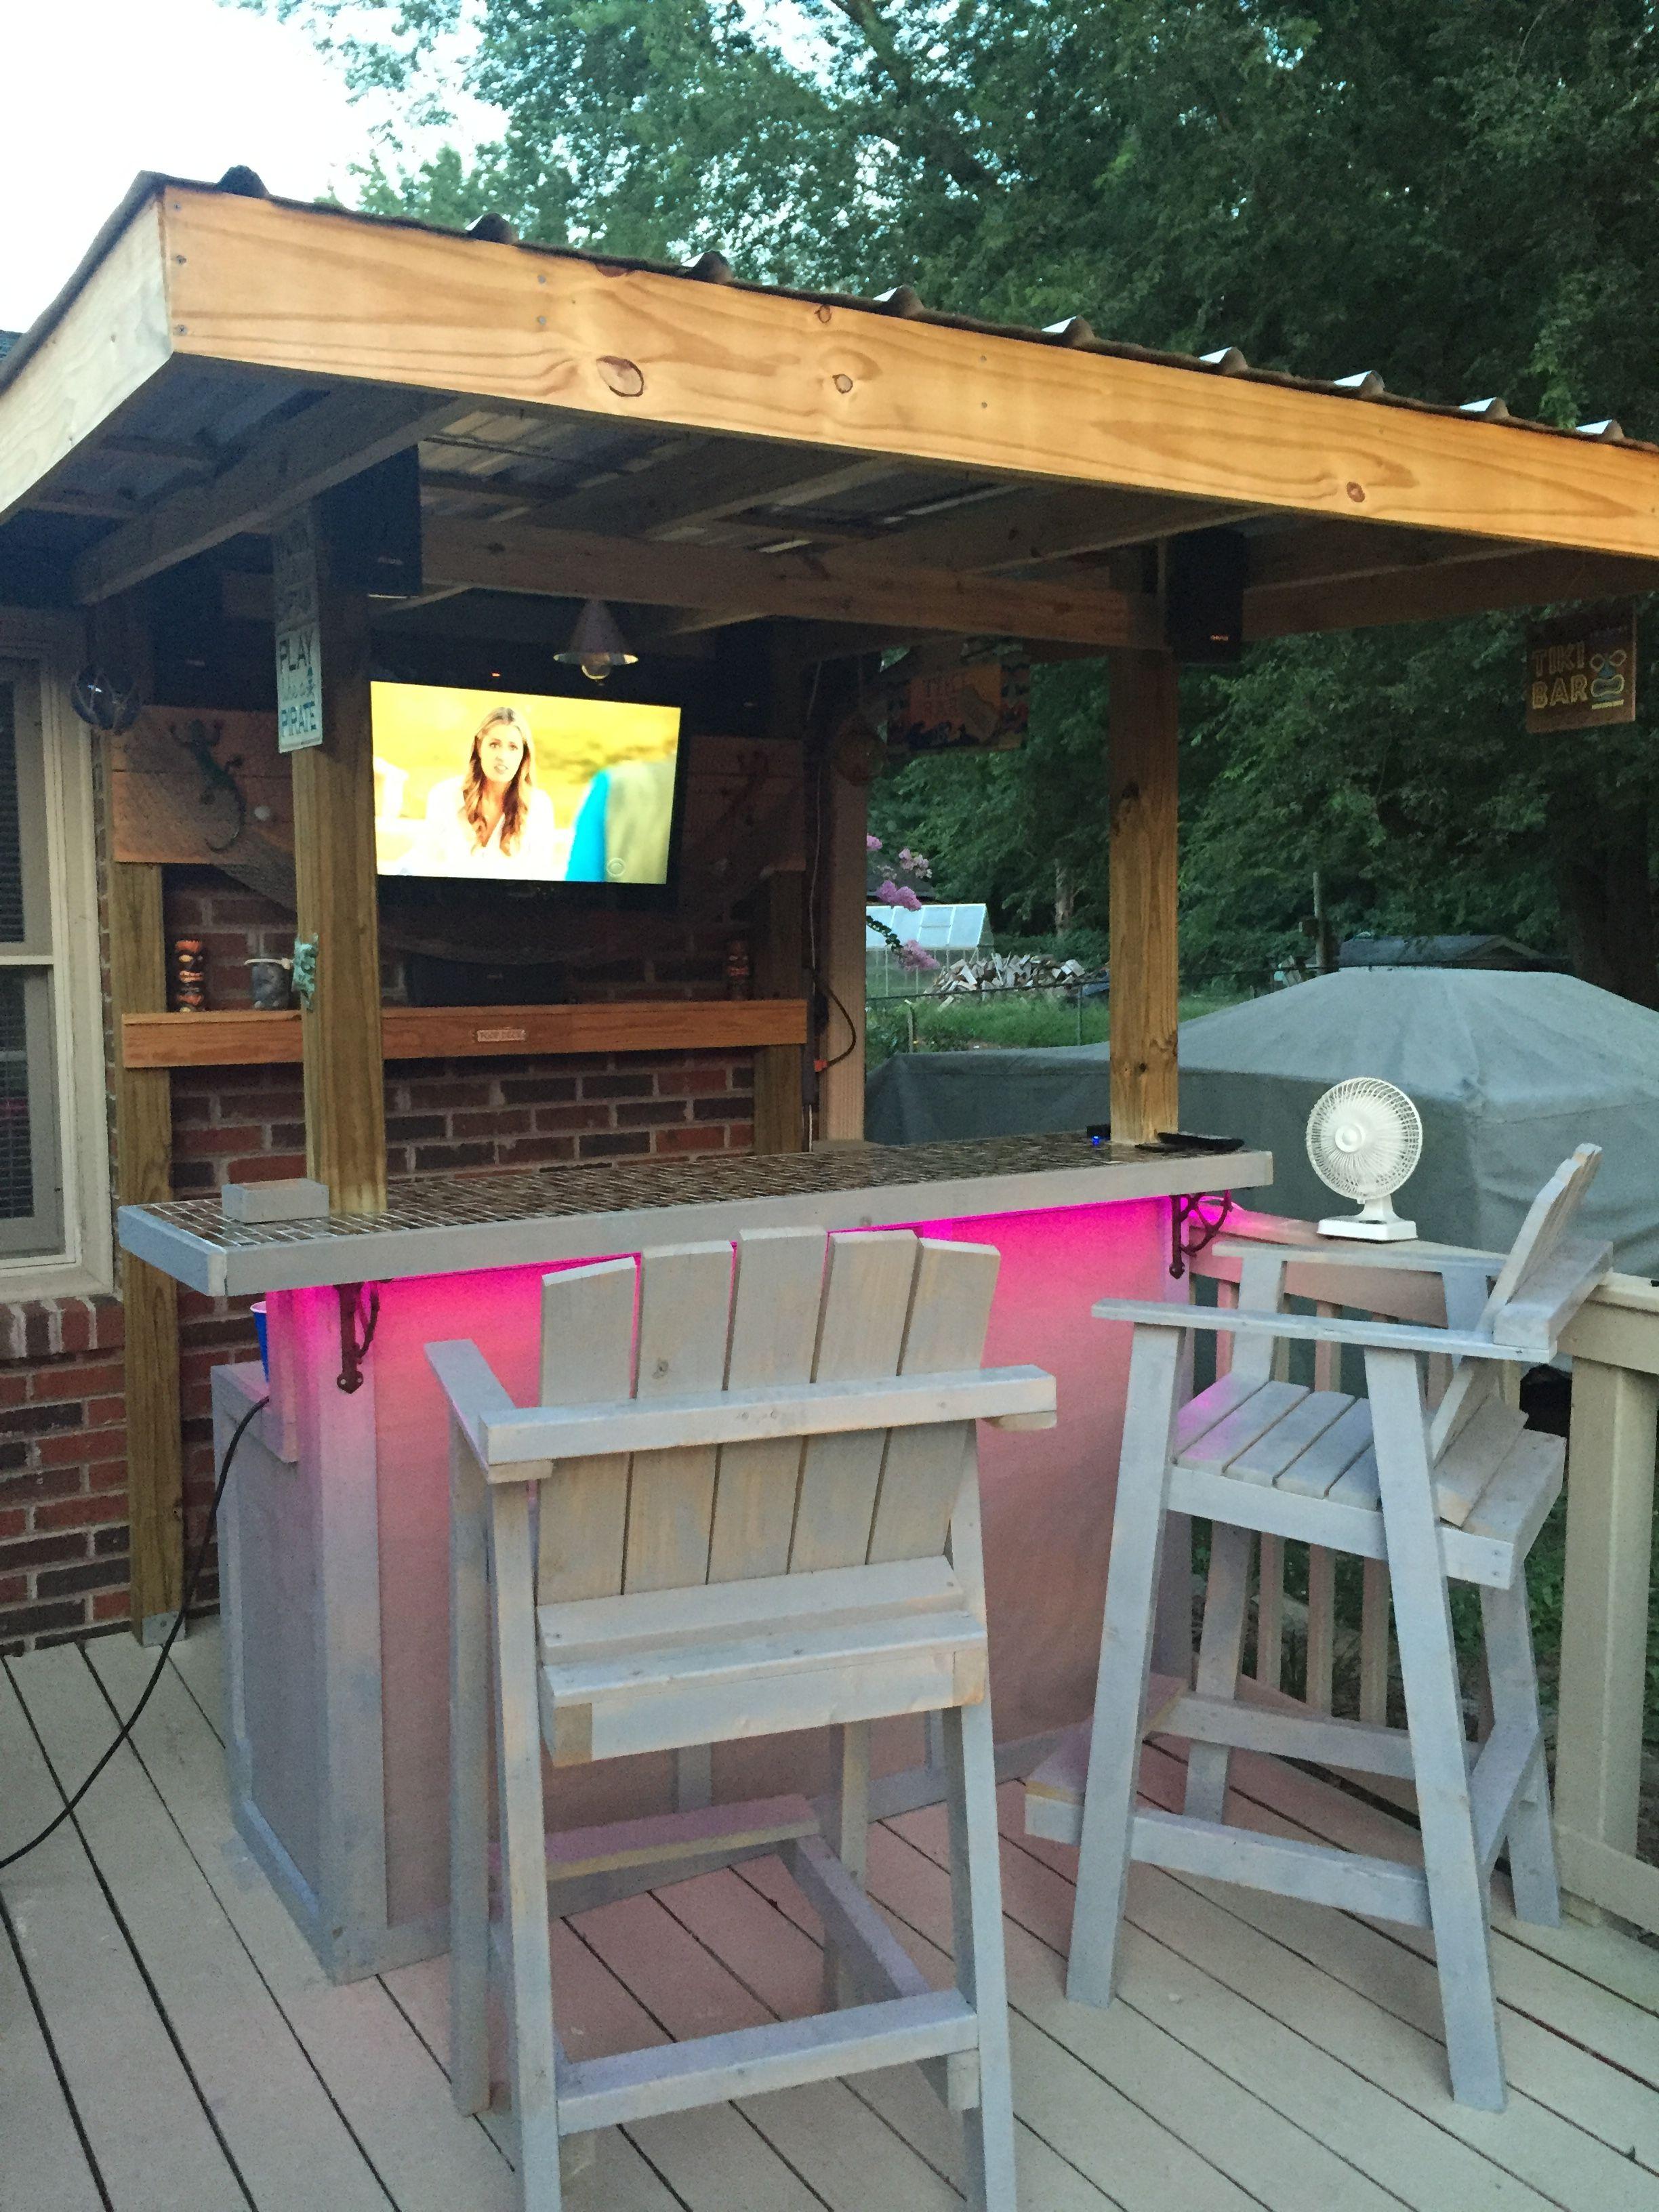 Back yard tiki bar | Outdoor living, Outdoor tables, Decor